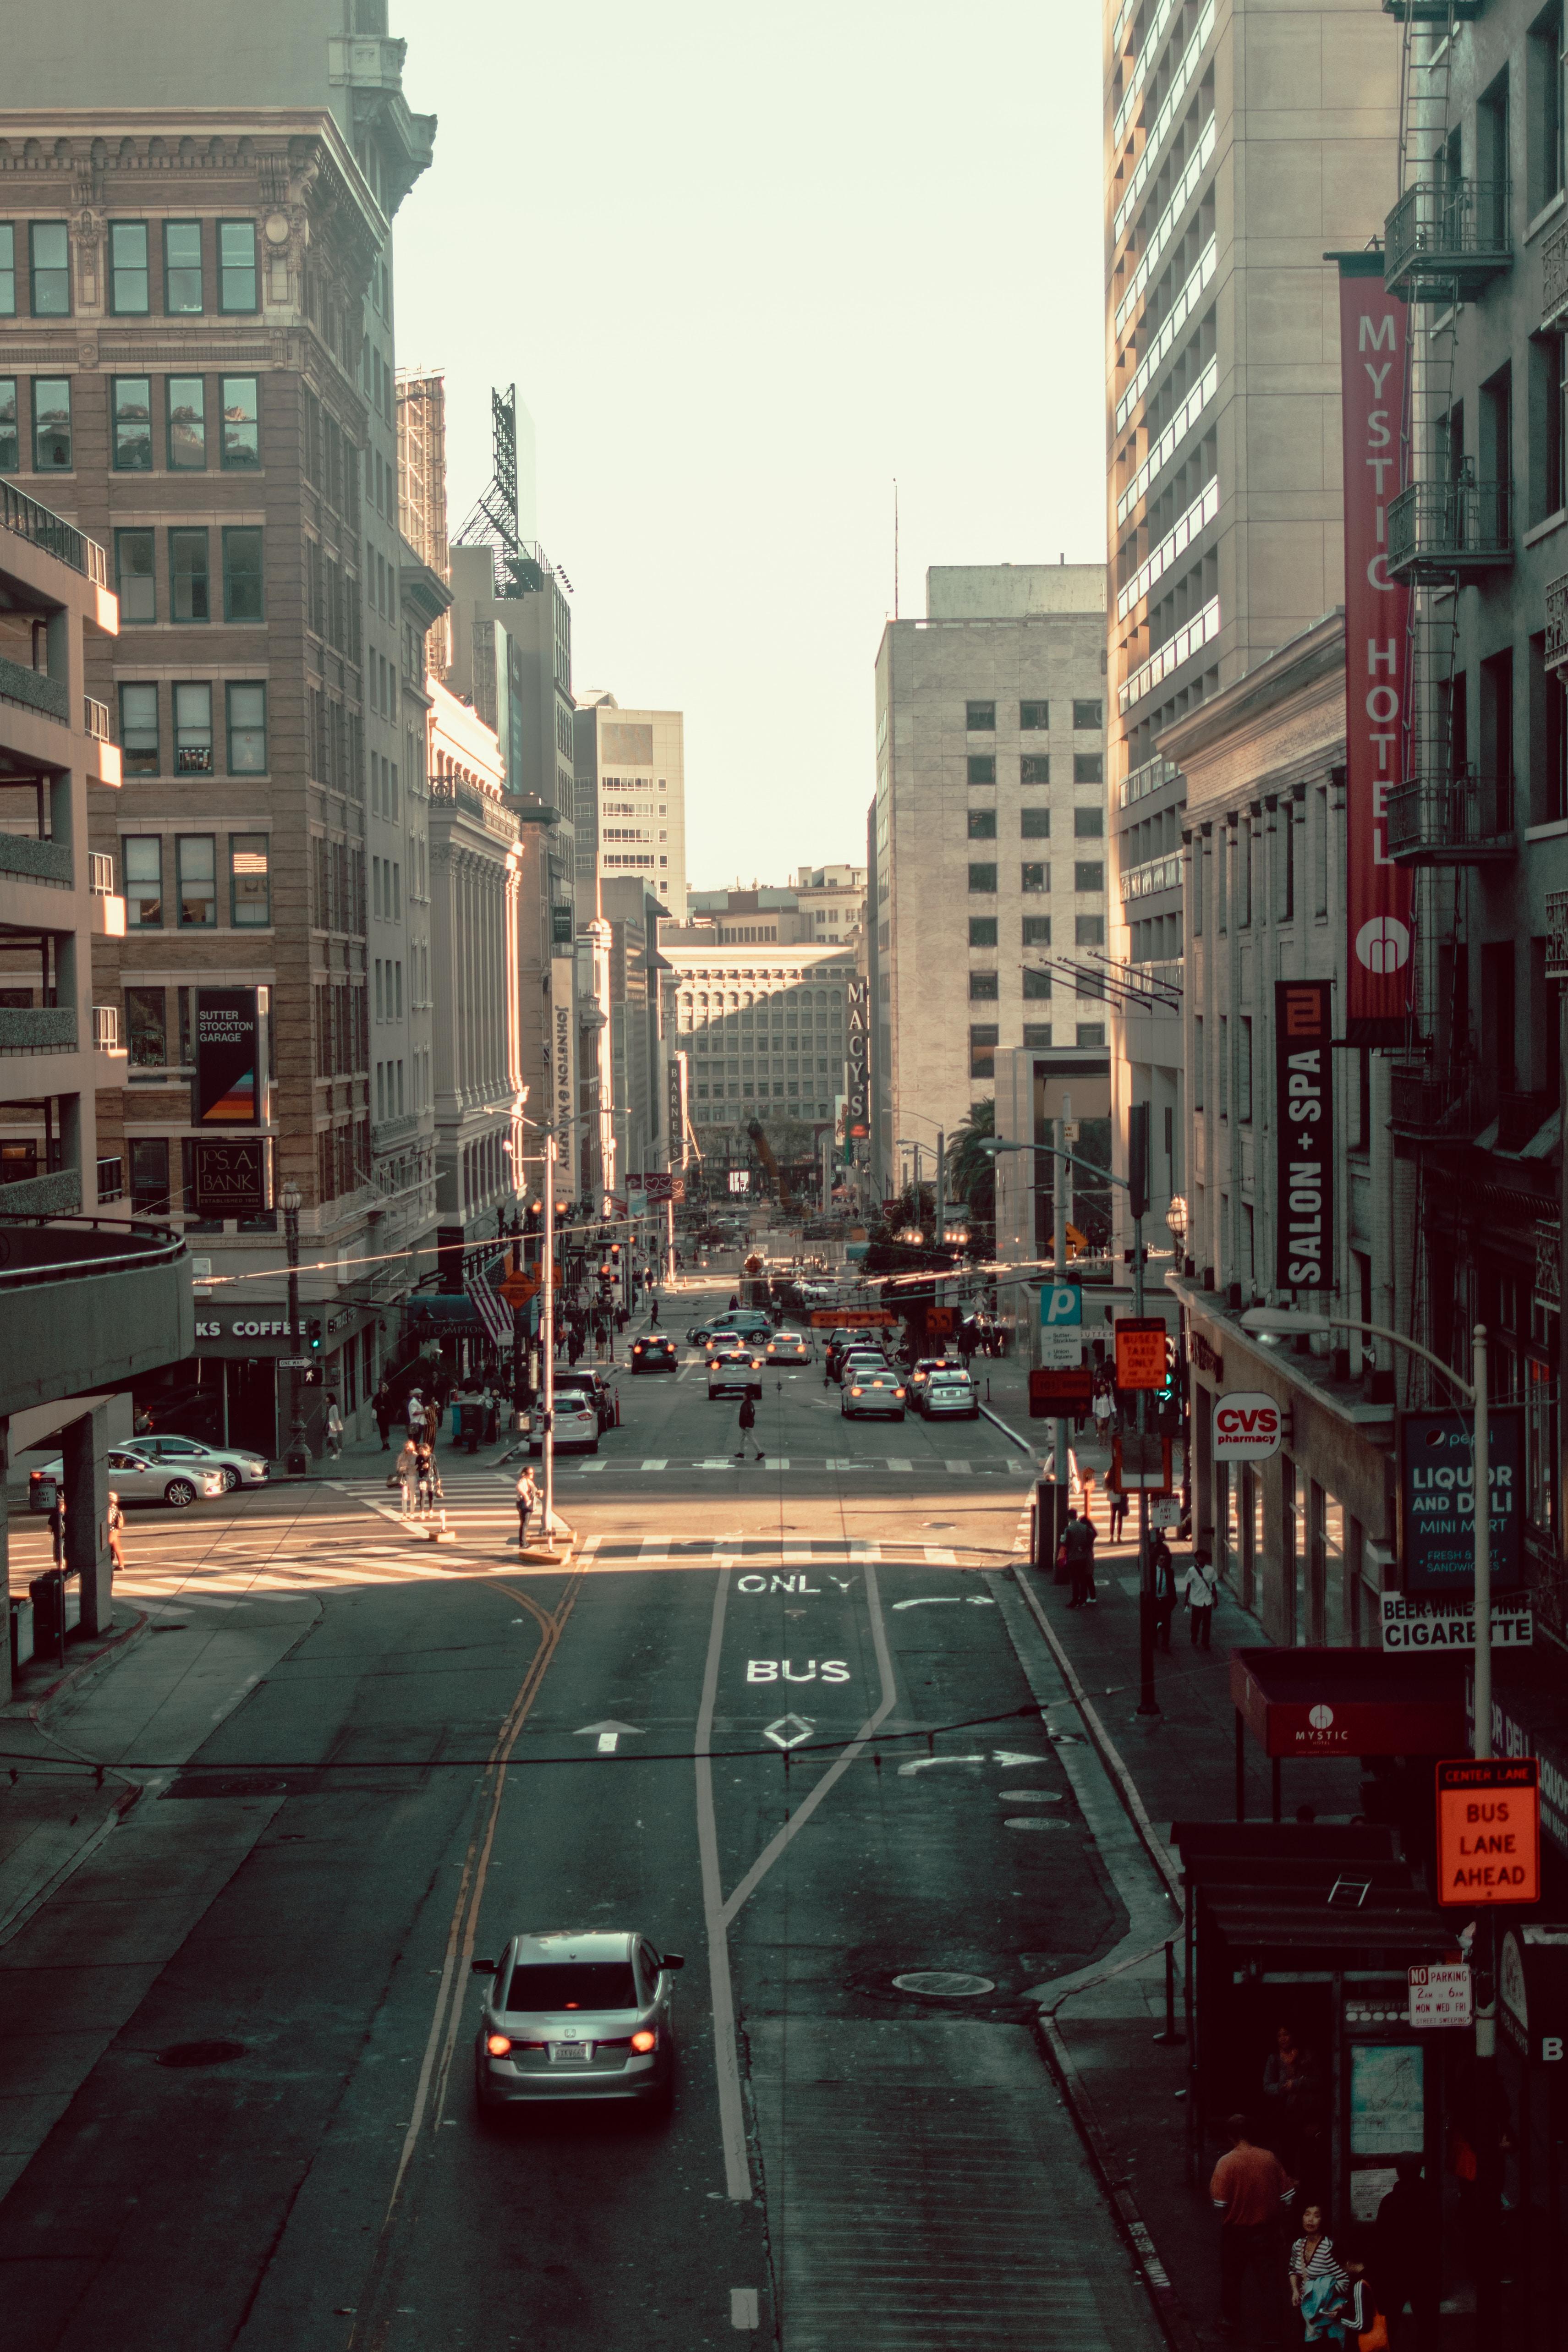 vehicles between buildings during daytime